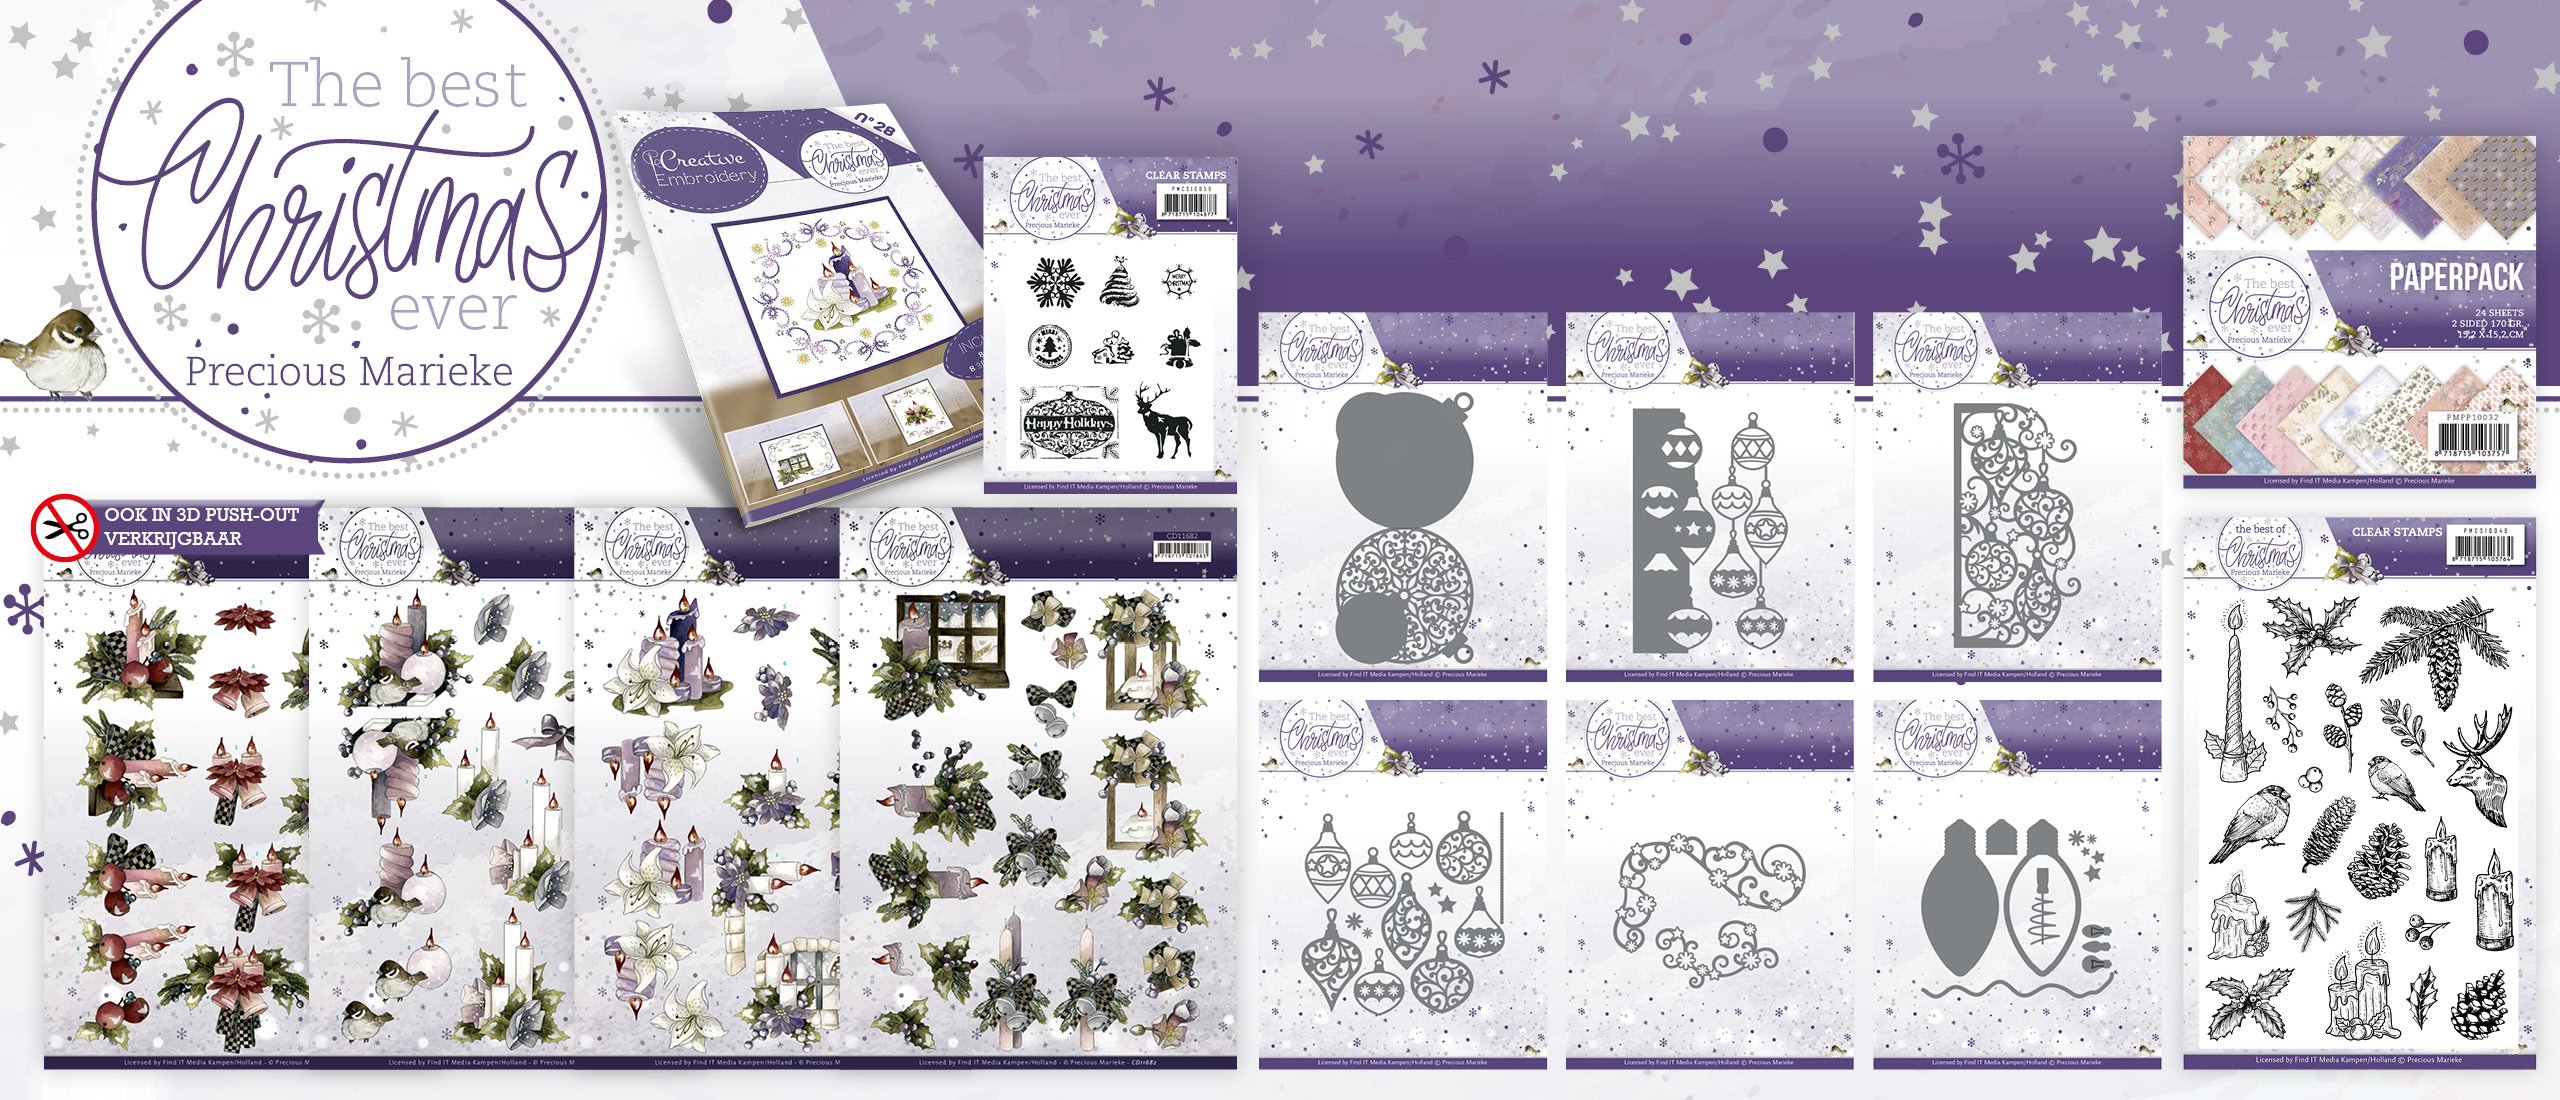 Collectie The Best Christmas Ever - Precious Marieke